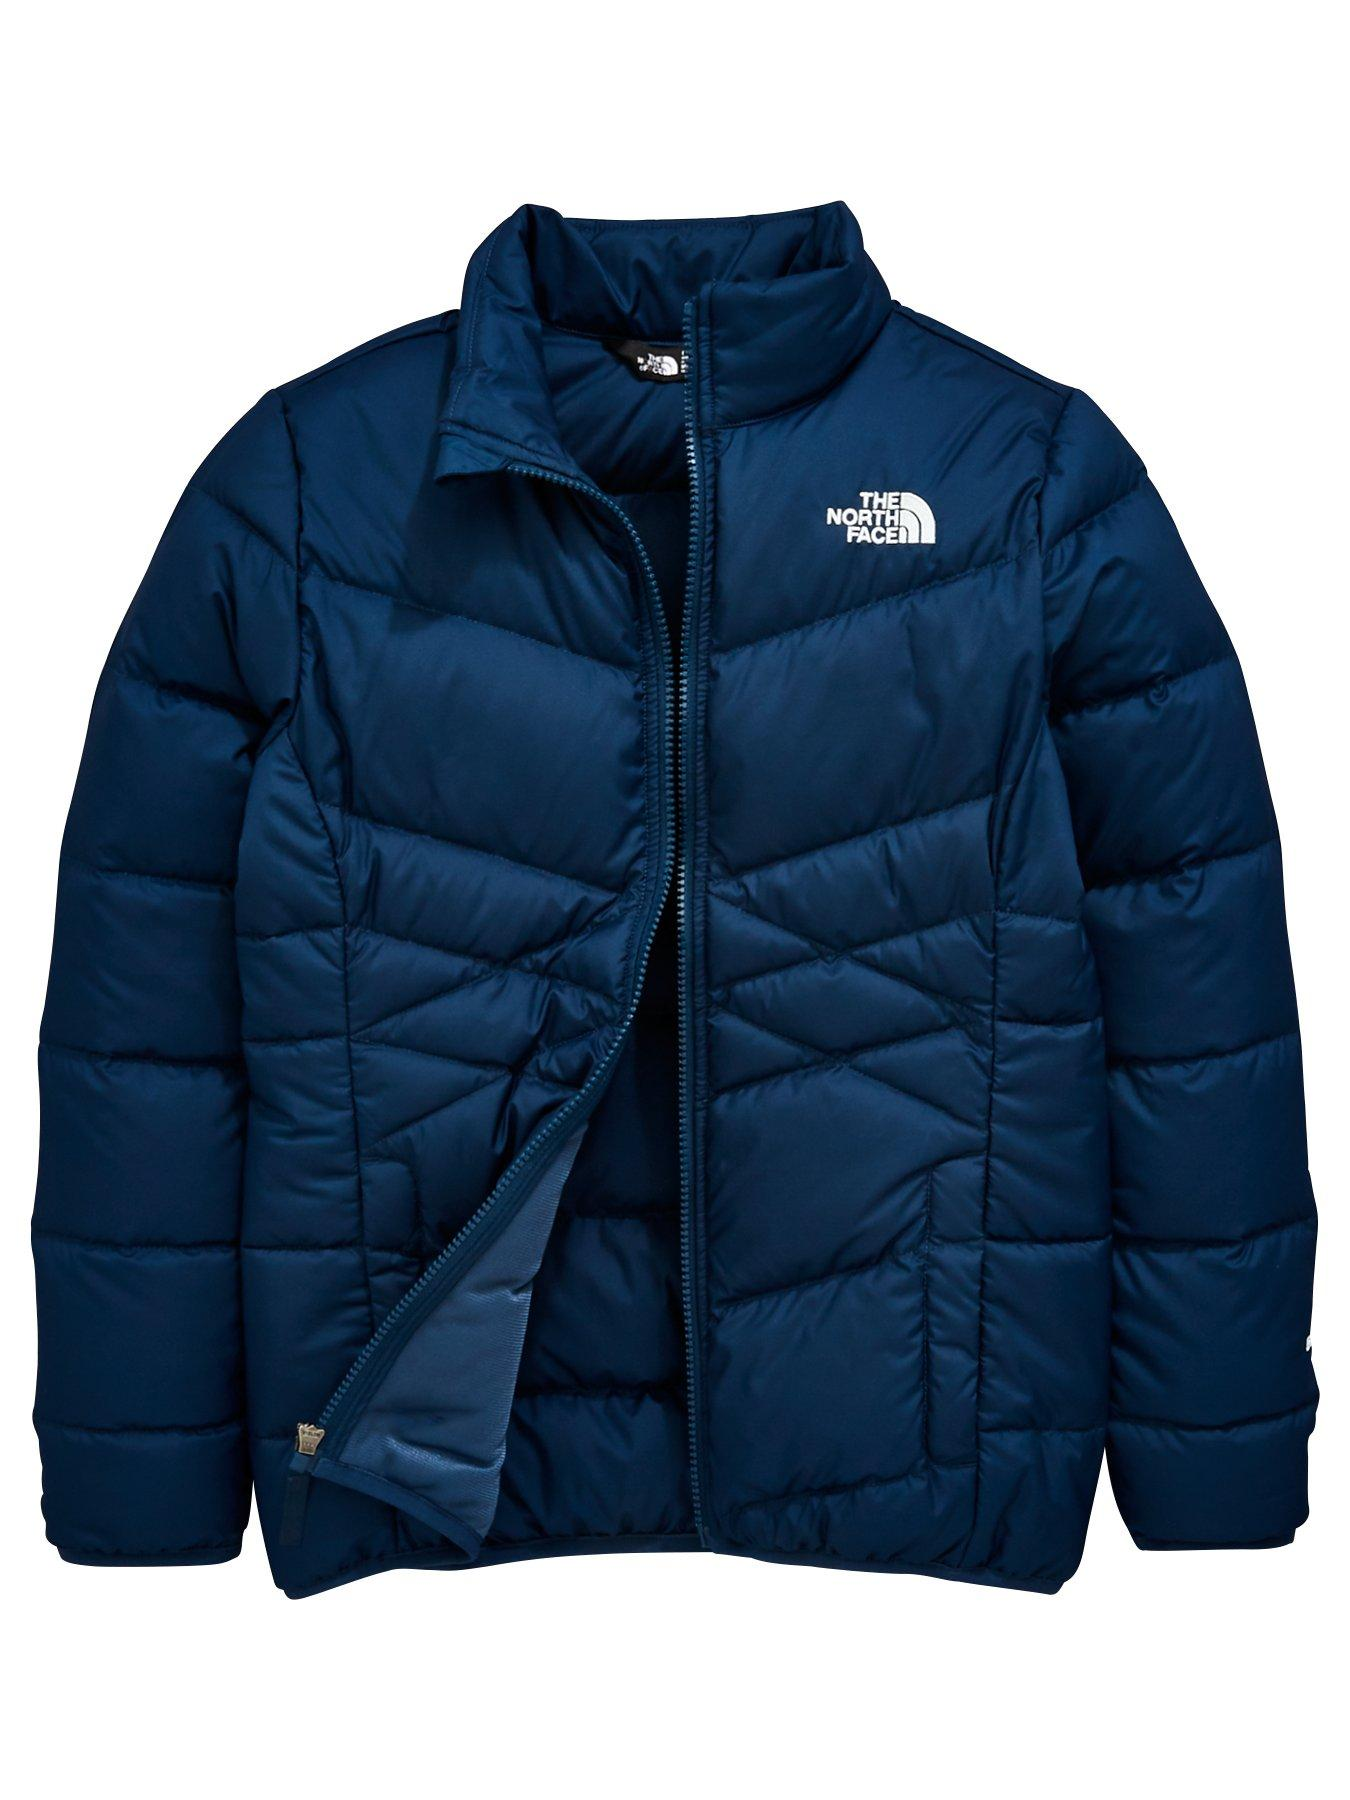 95bcb6f72 coupon code north face leopard jacket uk dacff e28f6